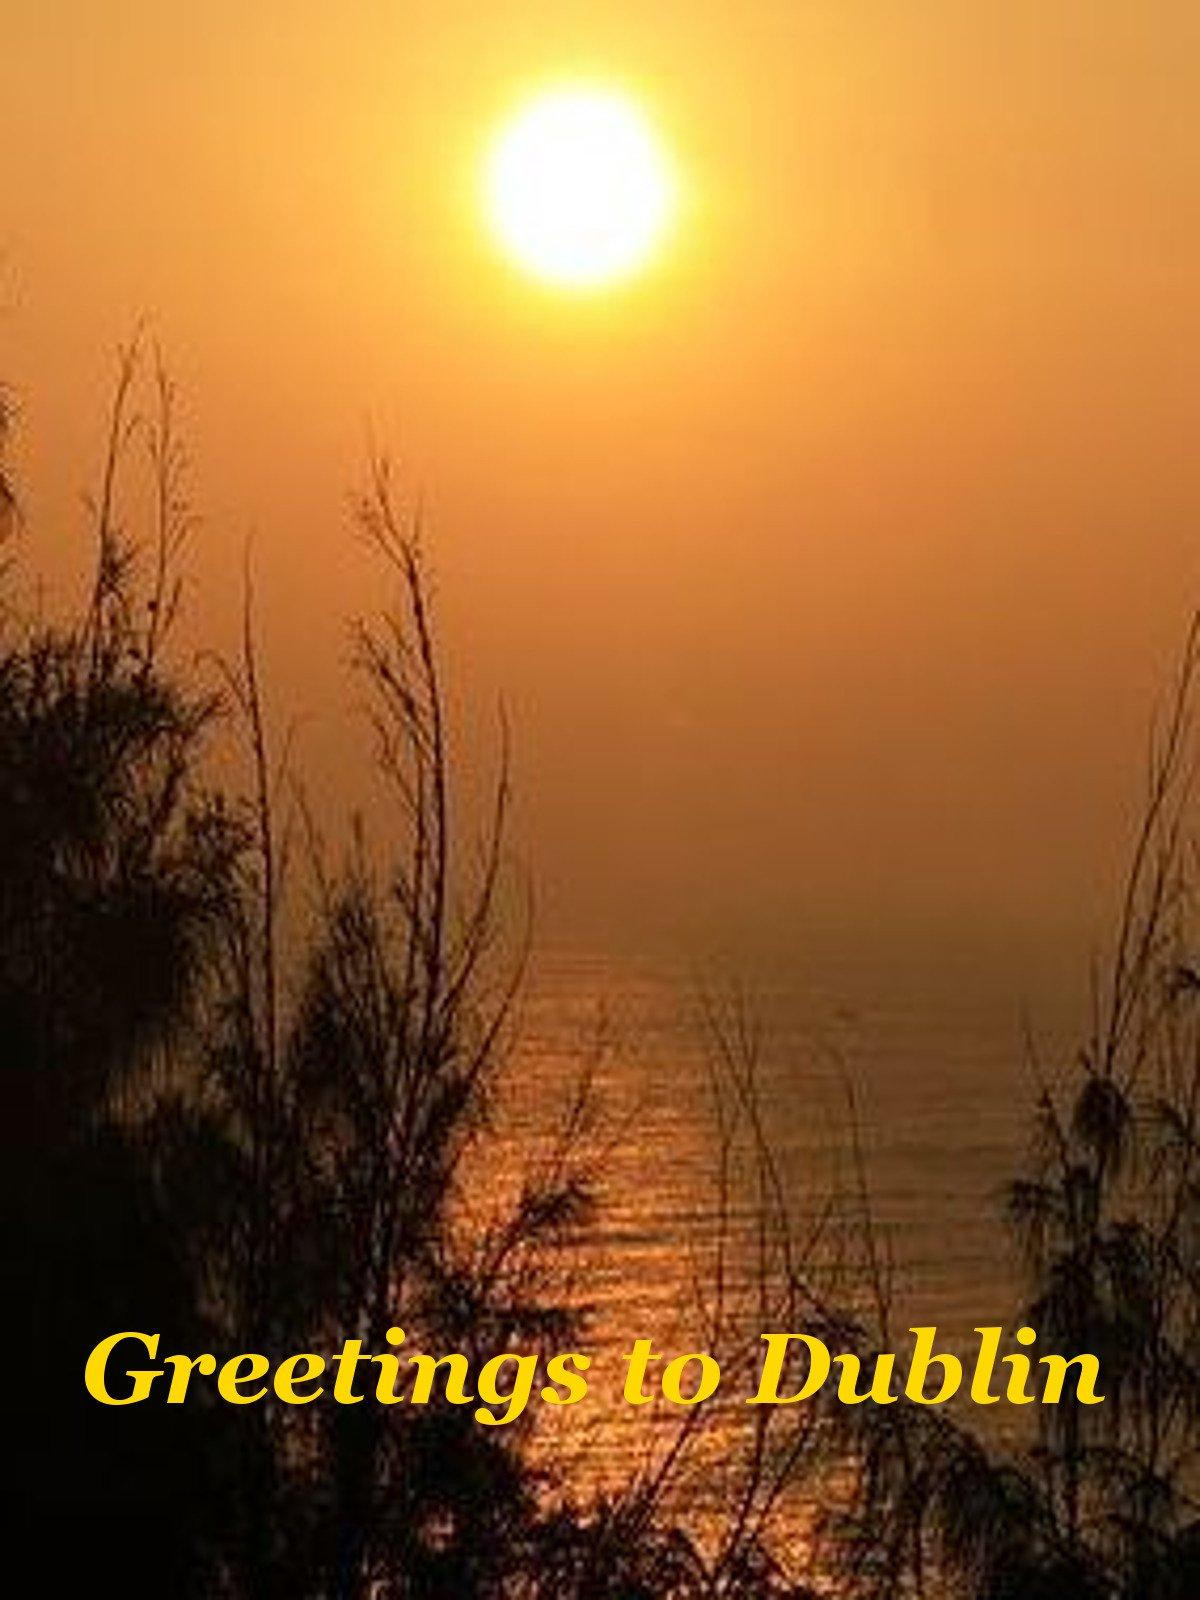 Clip: Greetings to Dublin